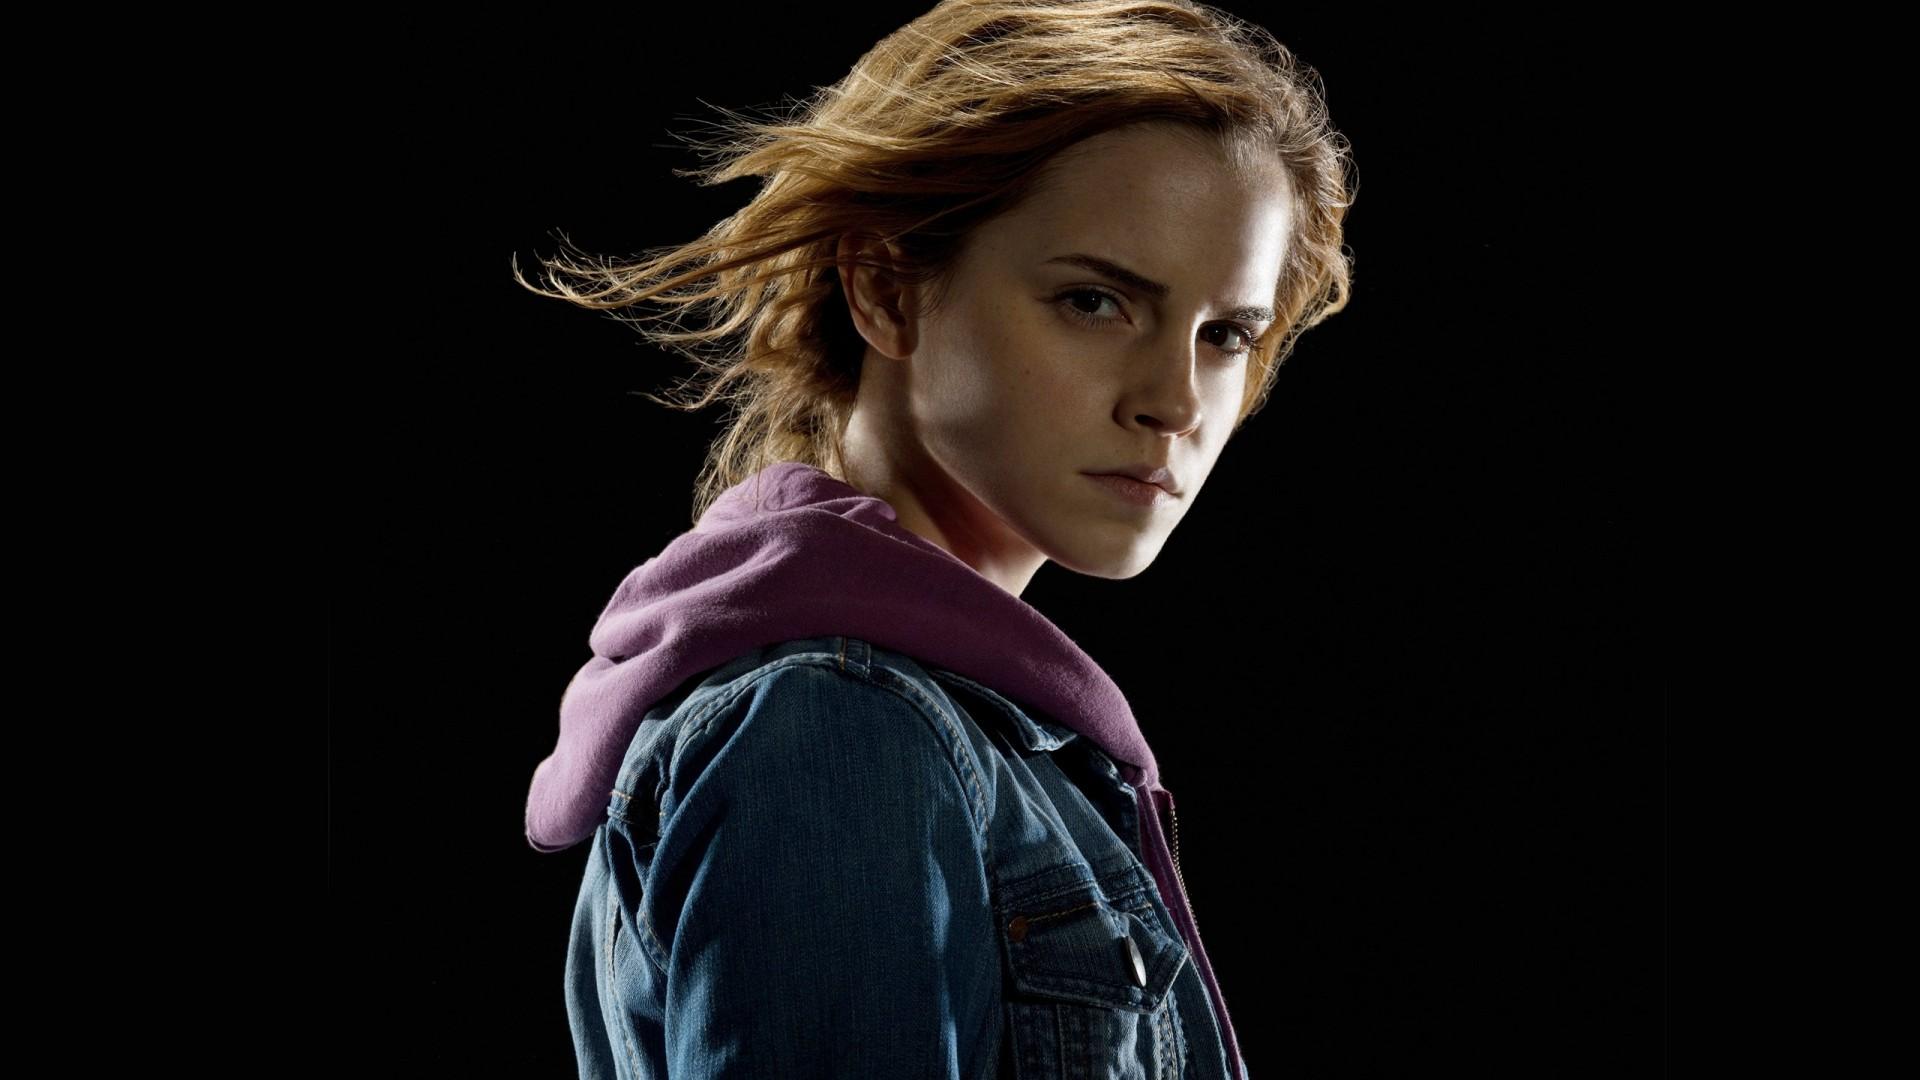 Emma Watson HD Wallpapers Hd Wallpaper 1920x1080 Mobile